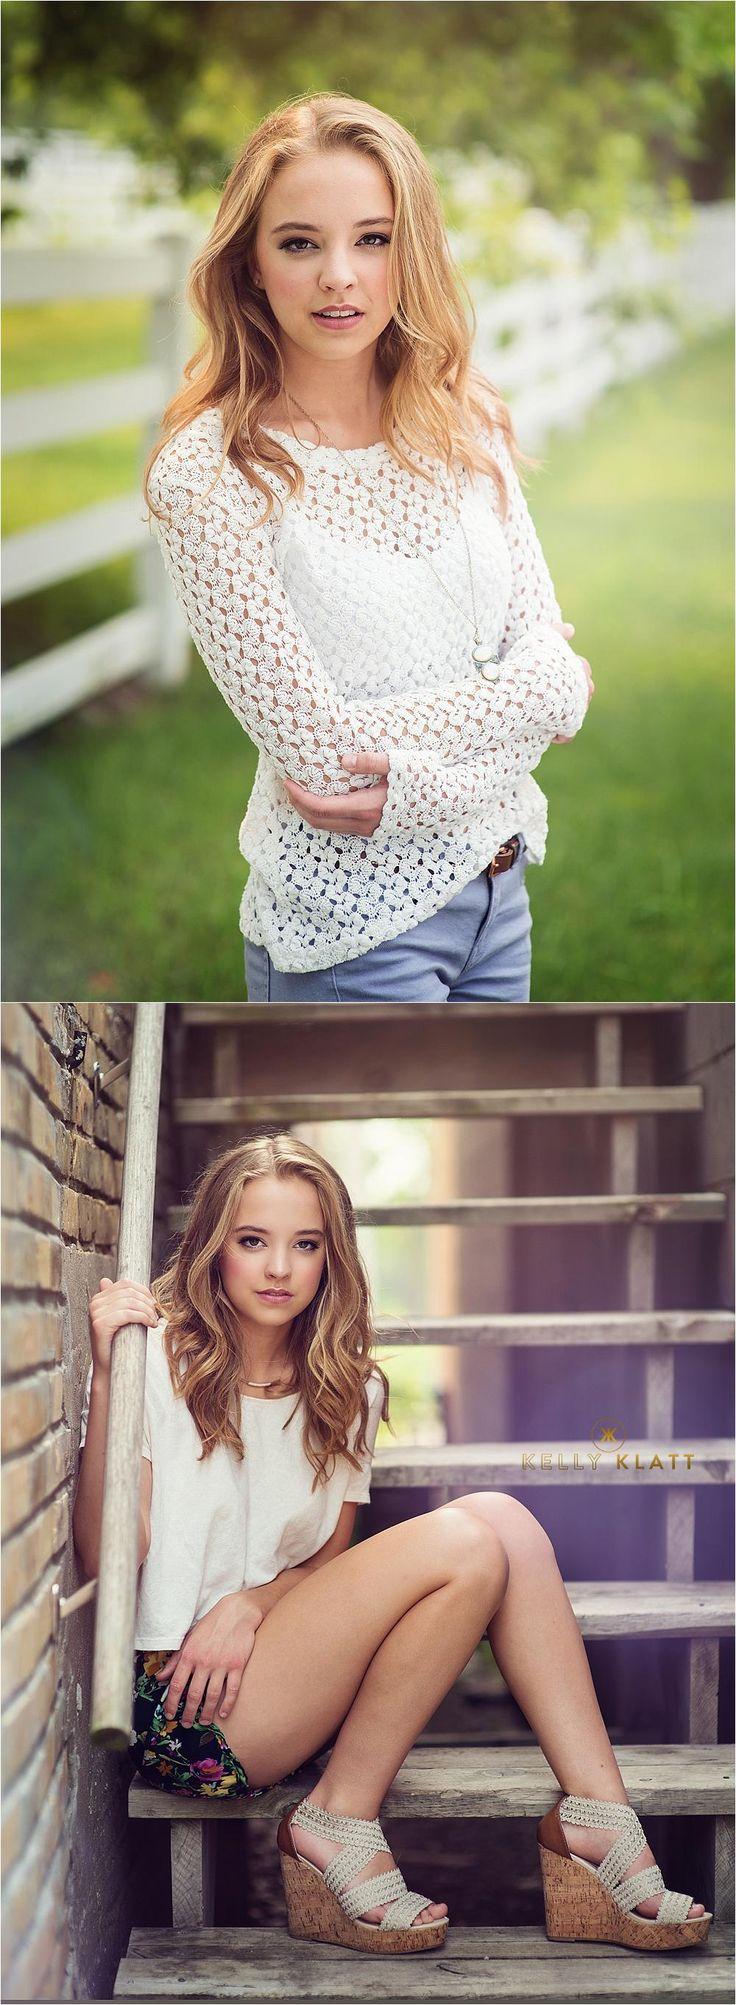 Photography by Kelly Klatt | Senior Pictures in Minnesota | Copyright @2015 | www.kellyklatt.com | what to wear for senior pictures